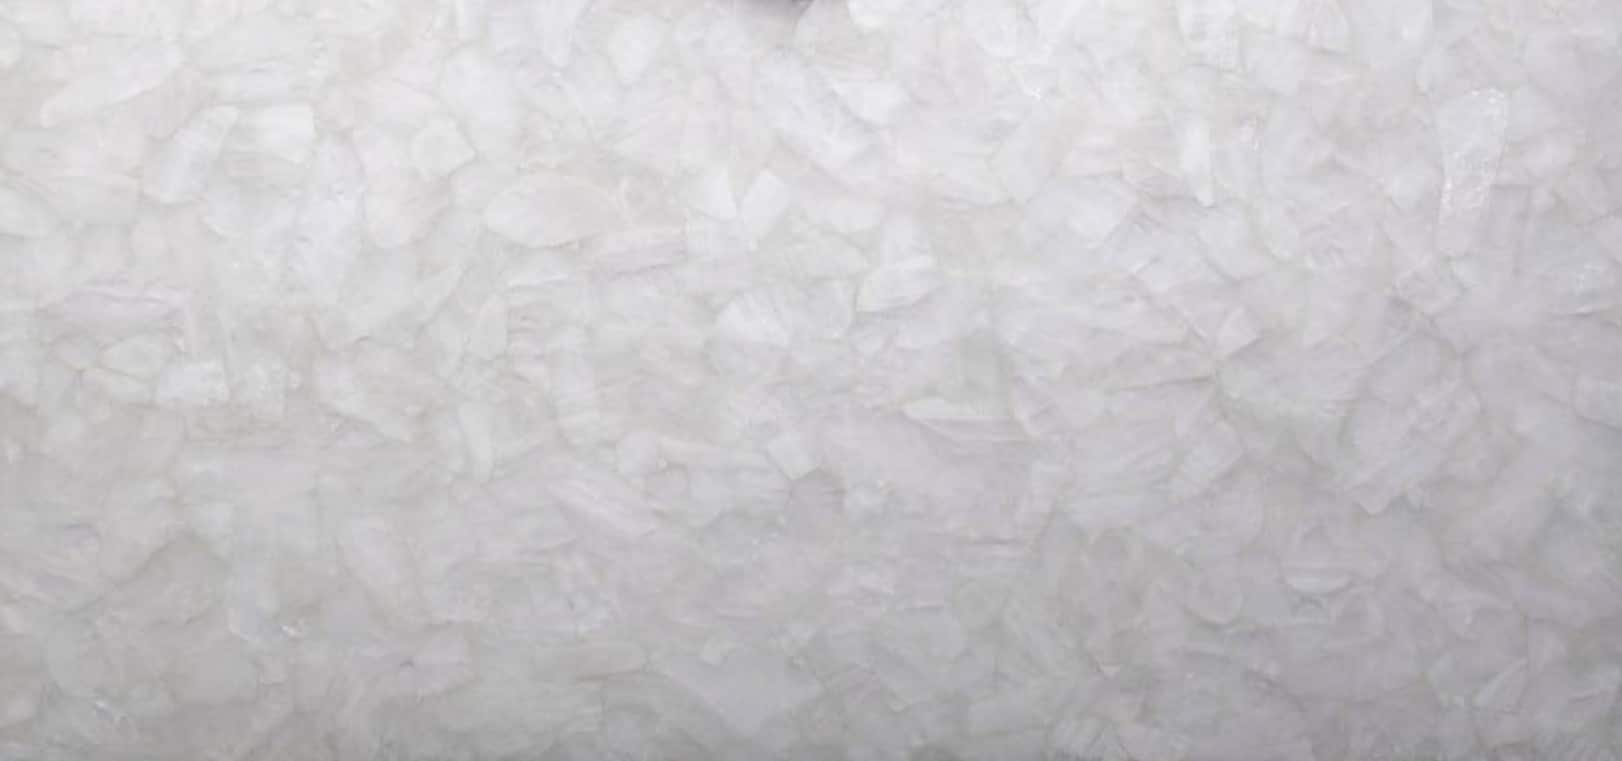 White Quartz Top Quality Semi Precious Collection